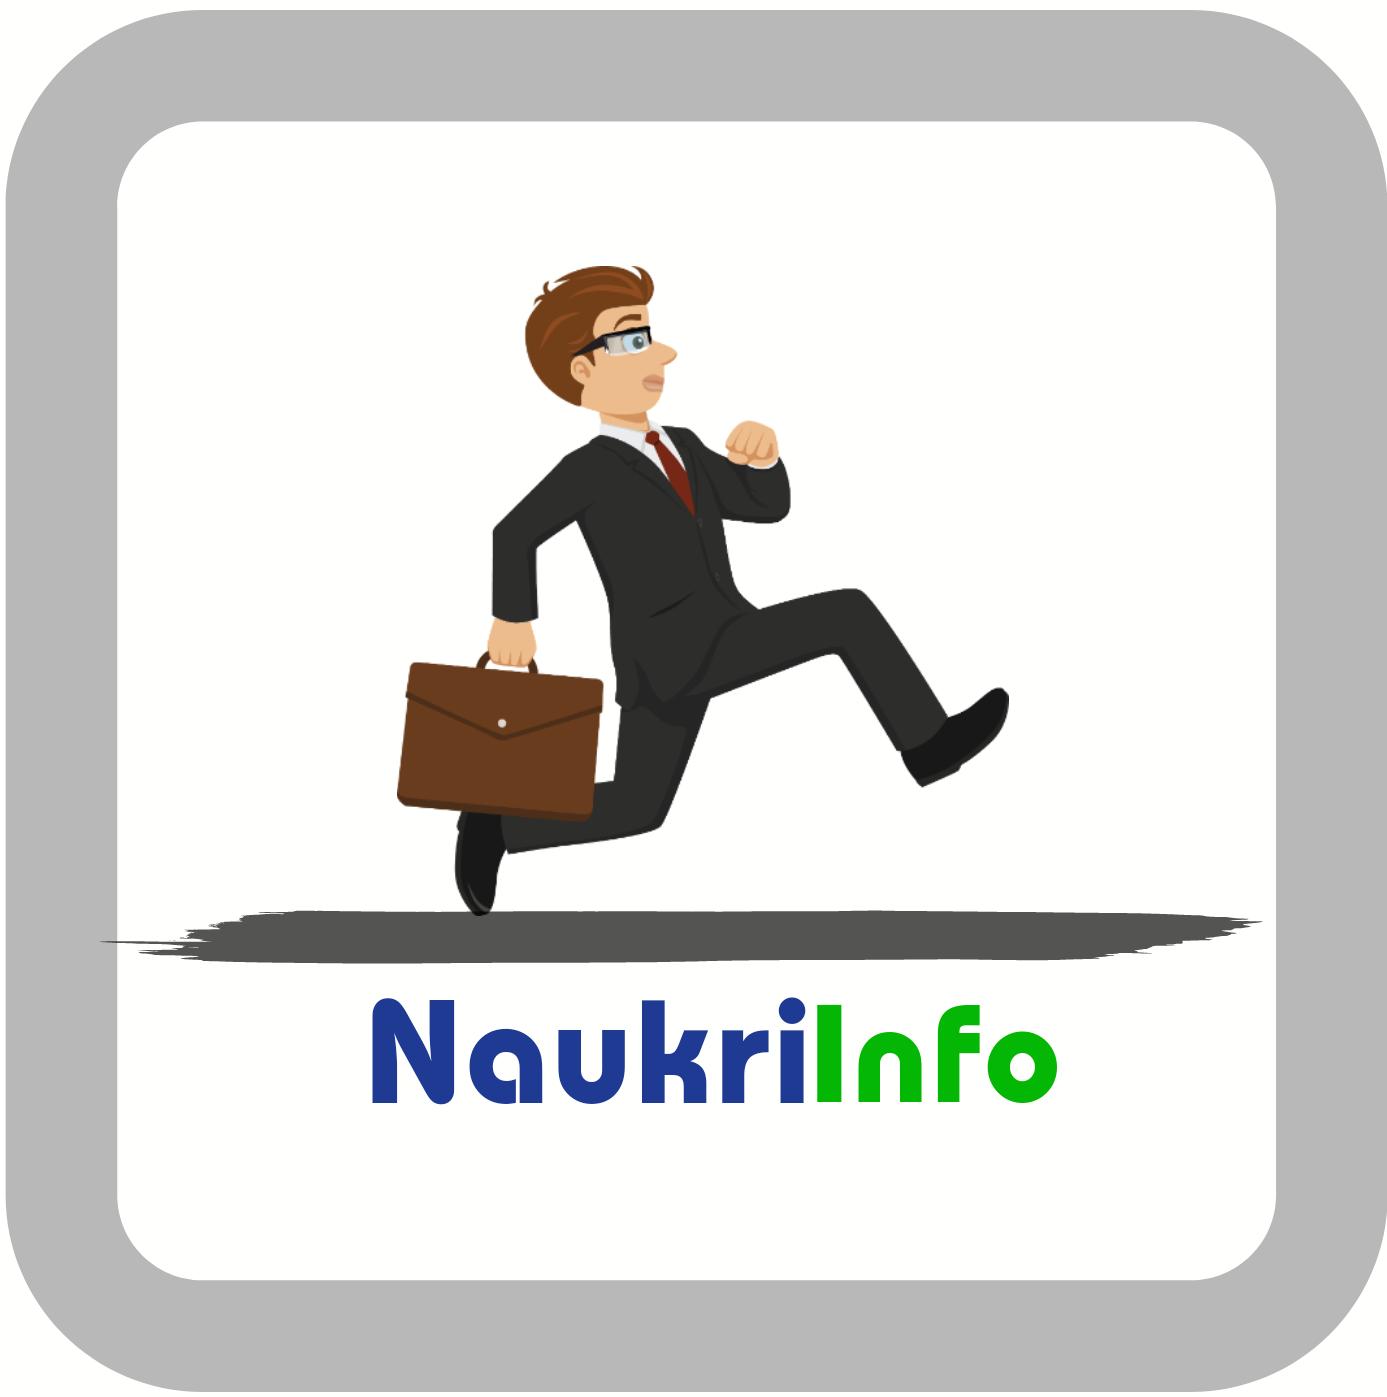 Naukri Info Share Business Card